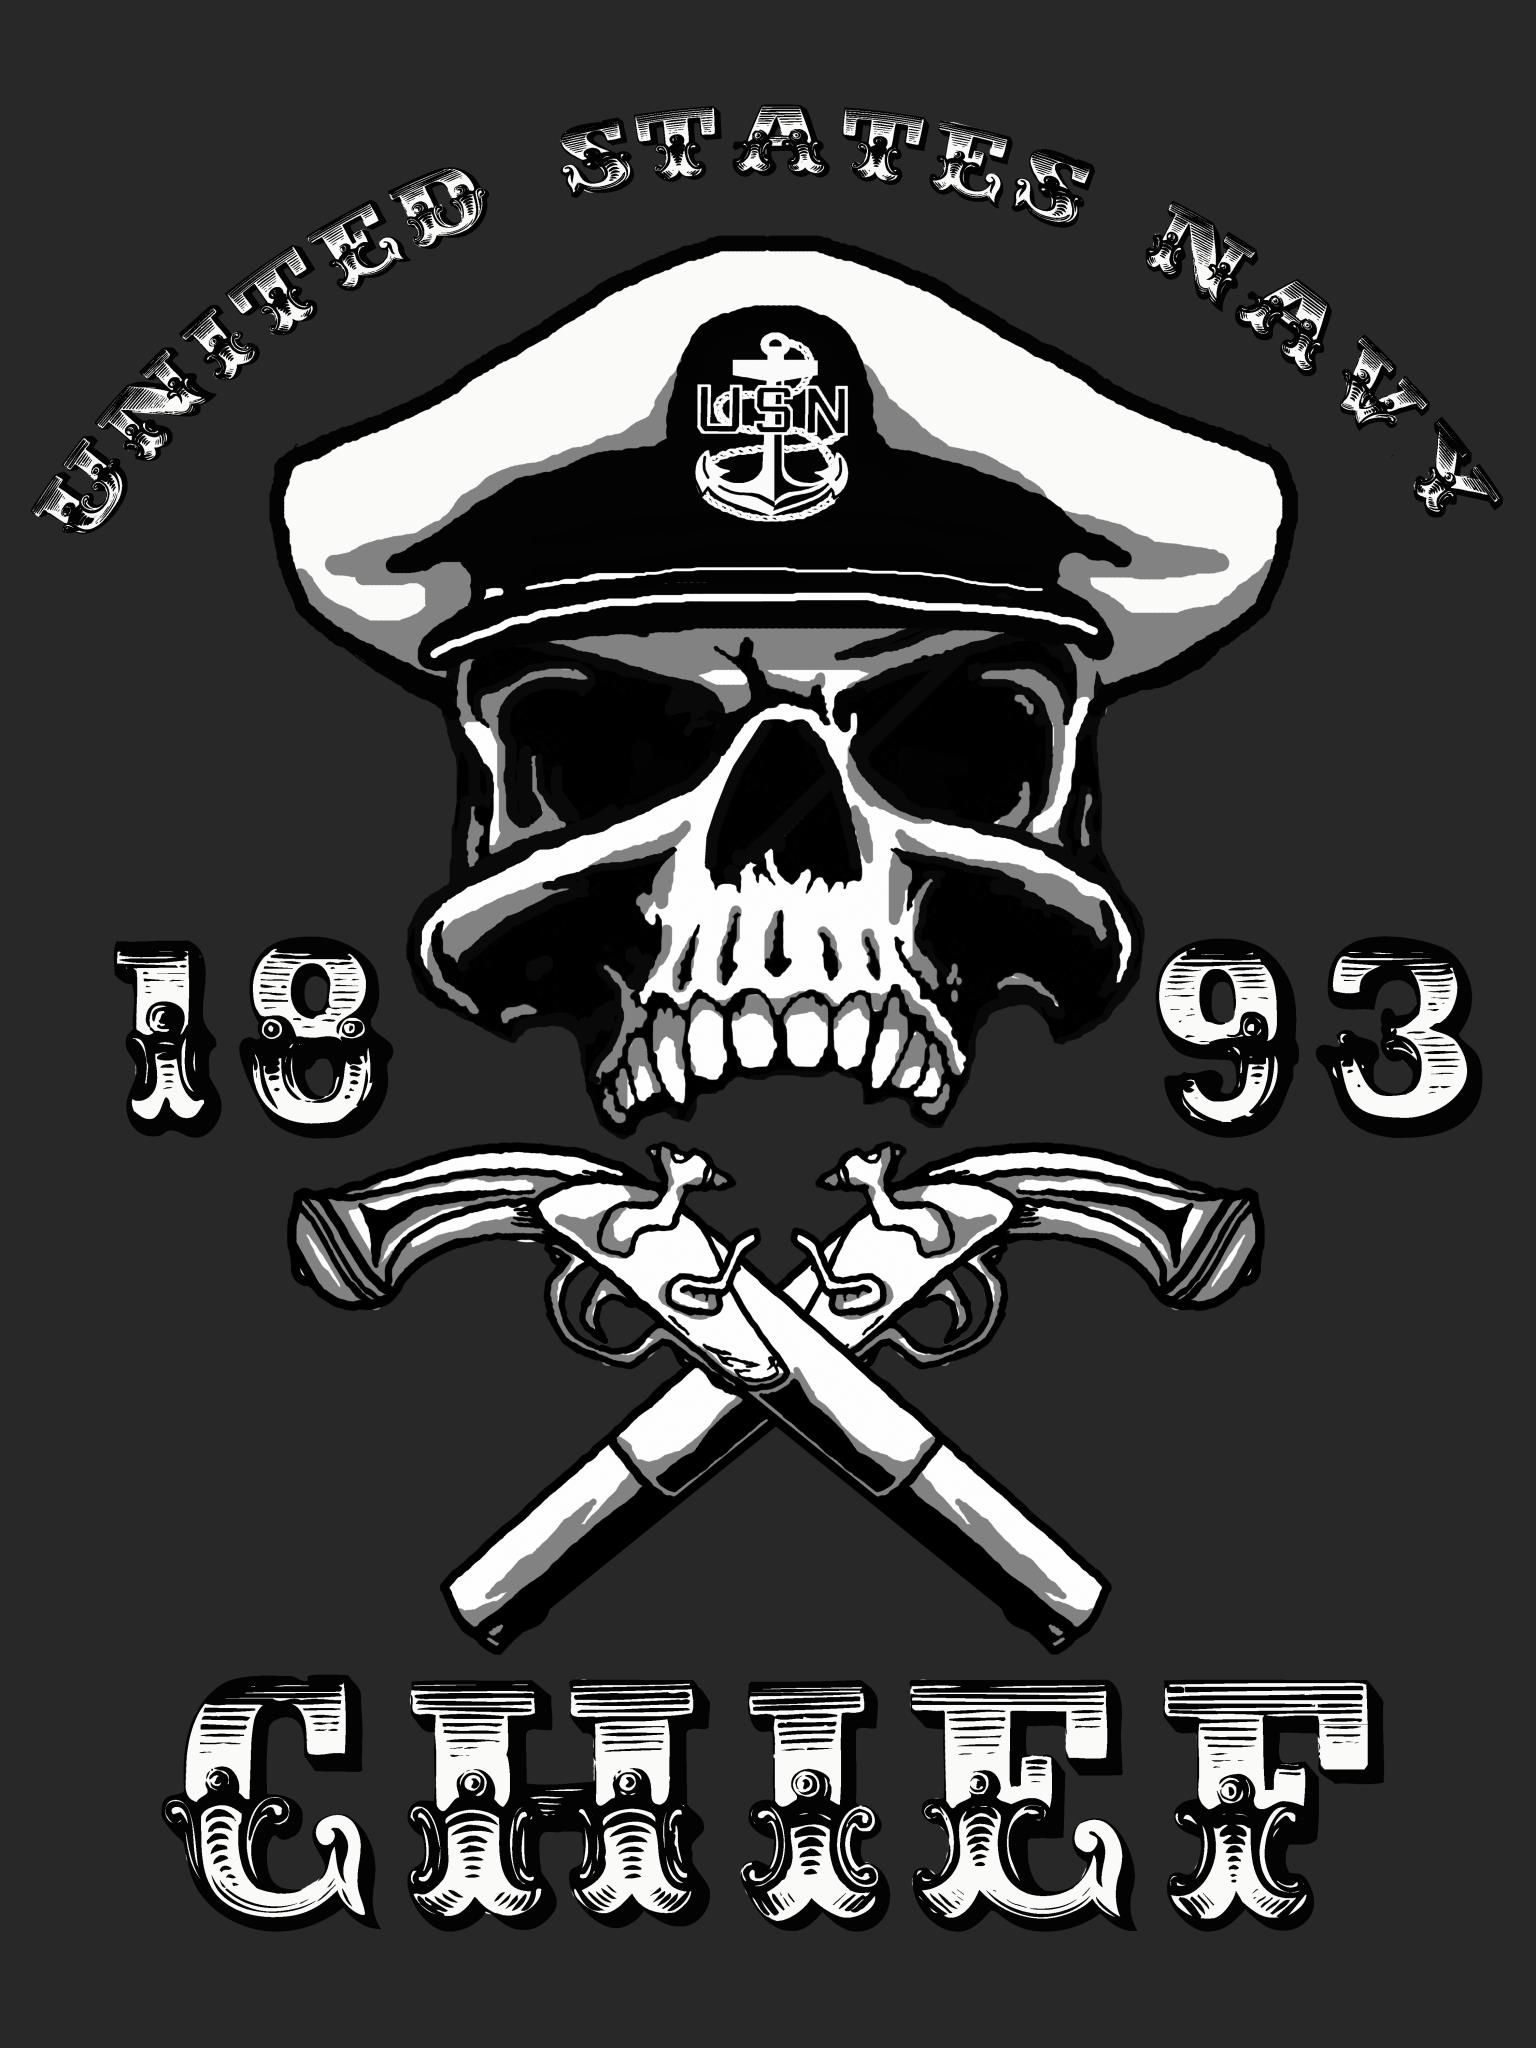 quotnavy senior chief skull and crossbonesquot color vinyl